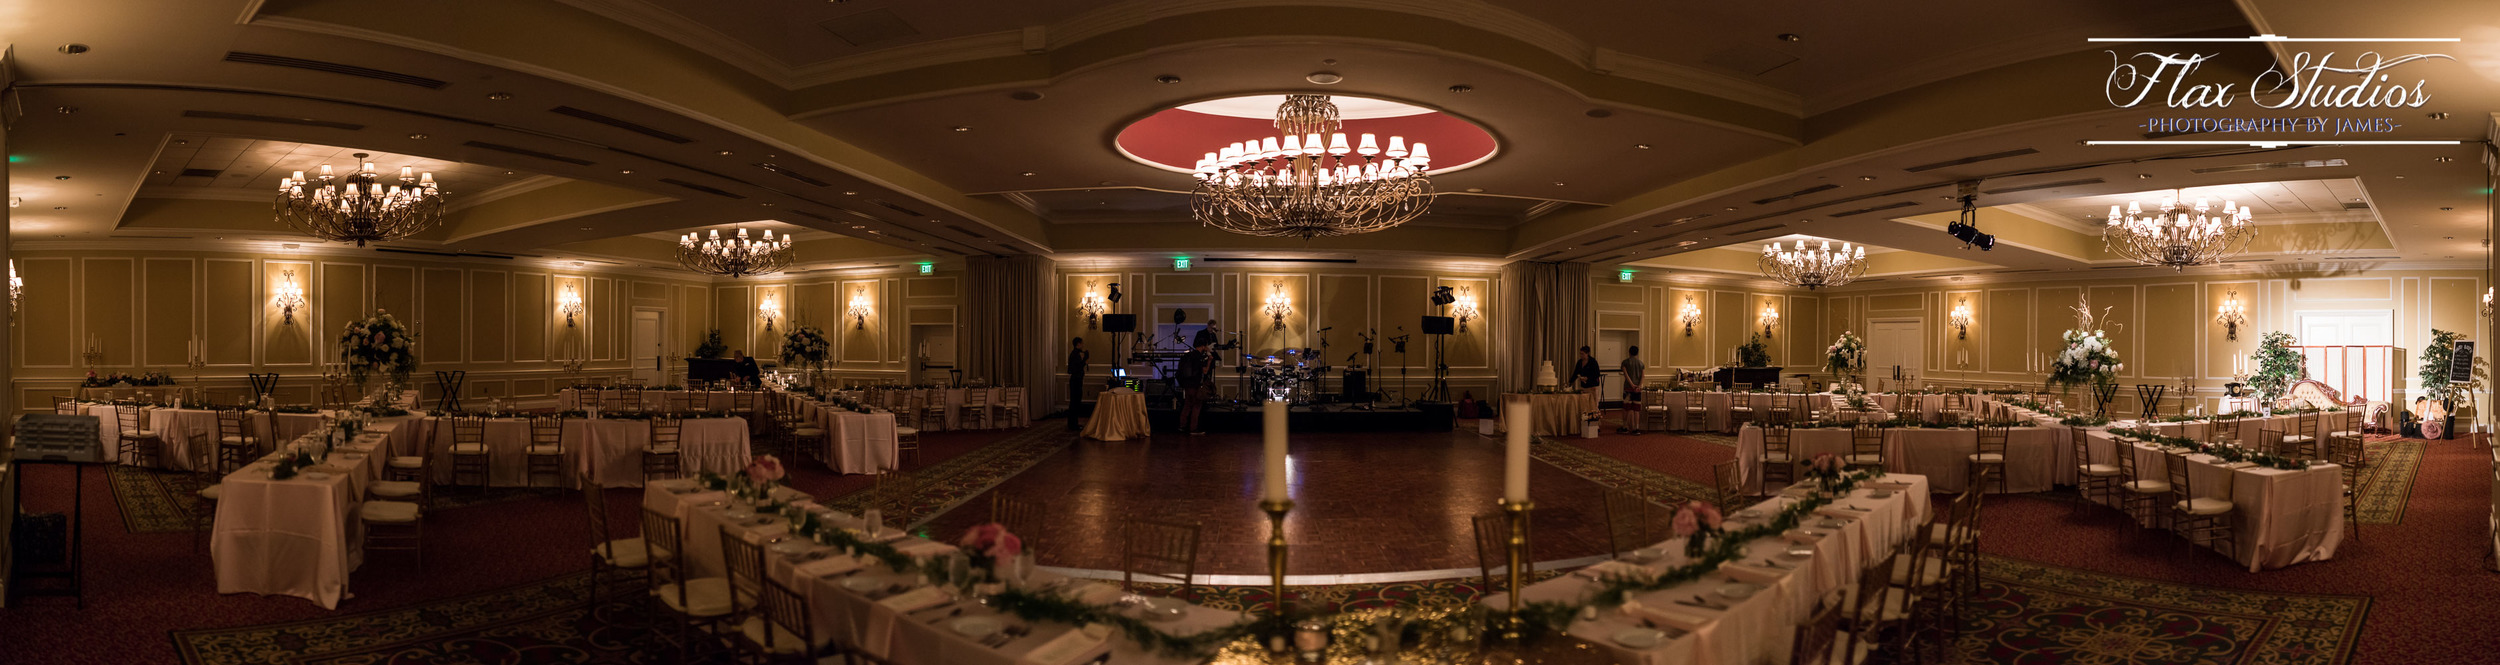 Samoset Ballroom Panorama